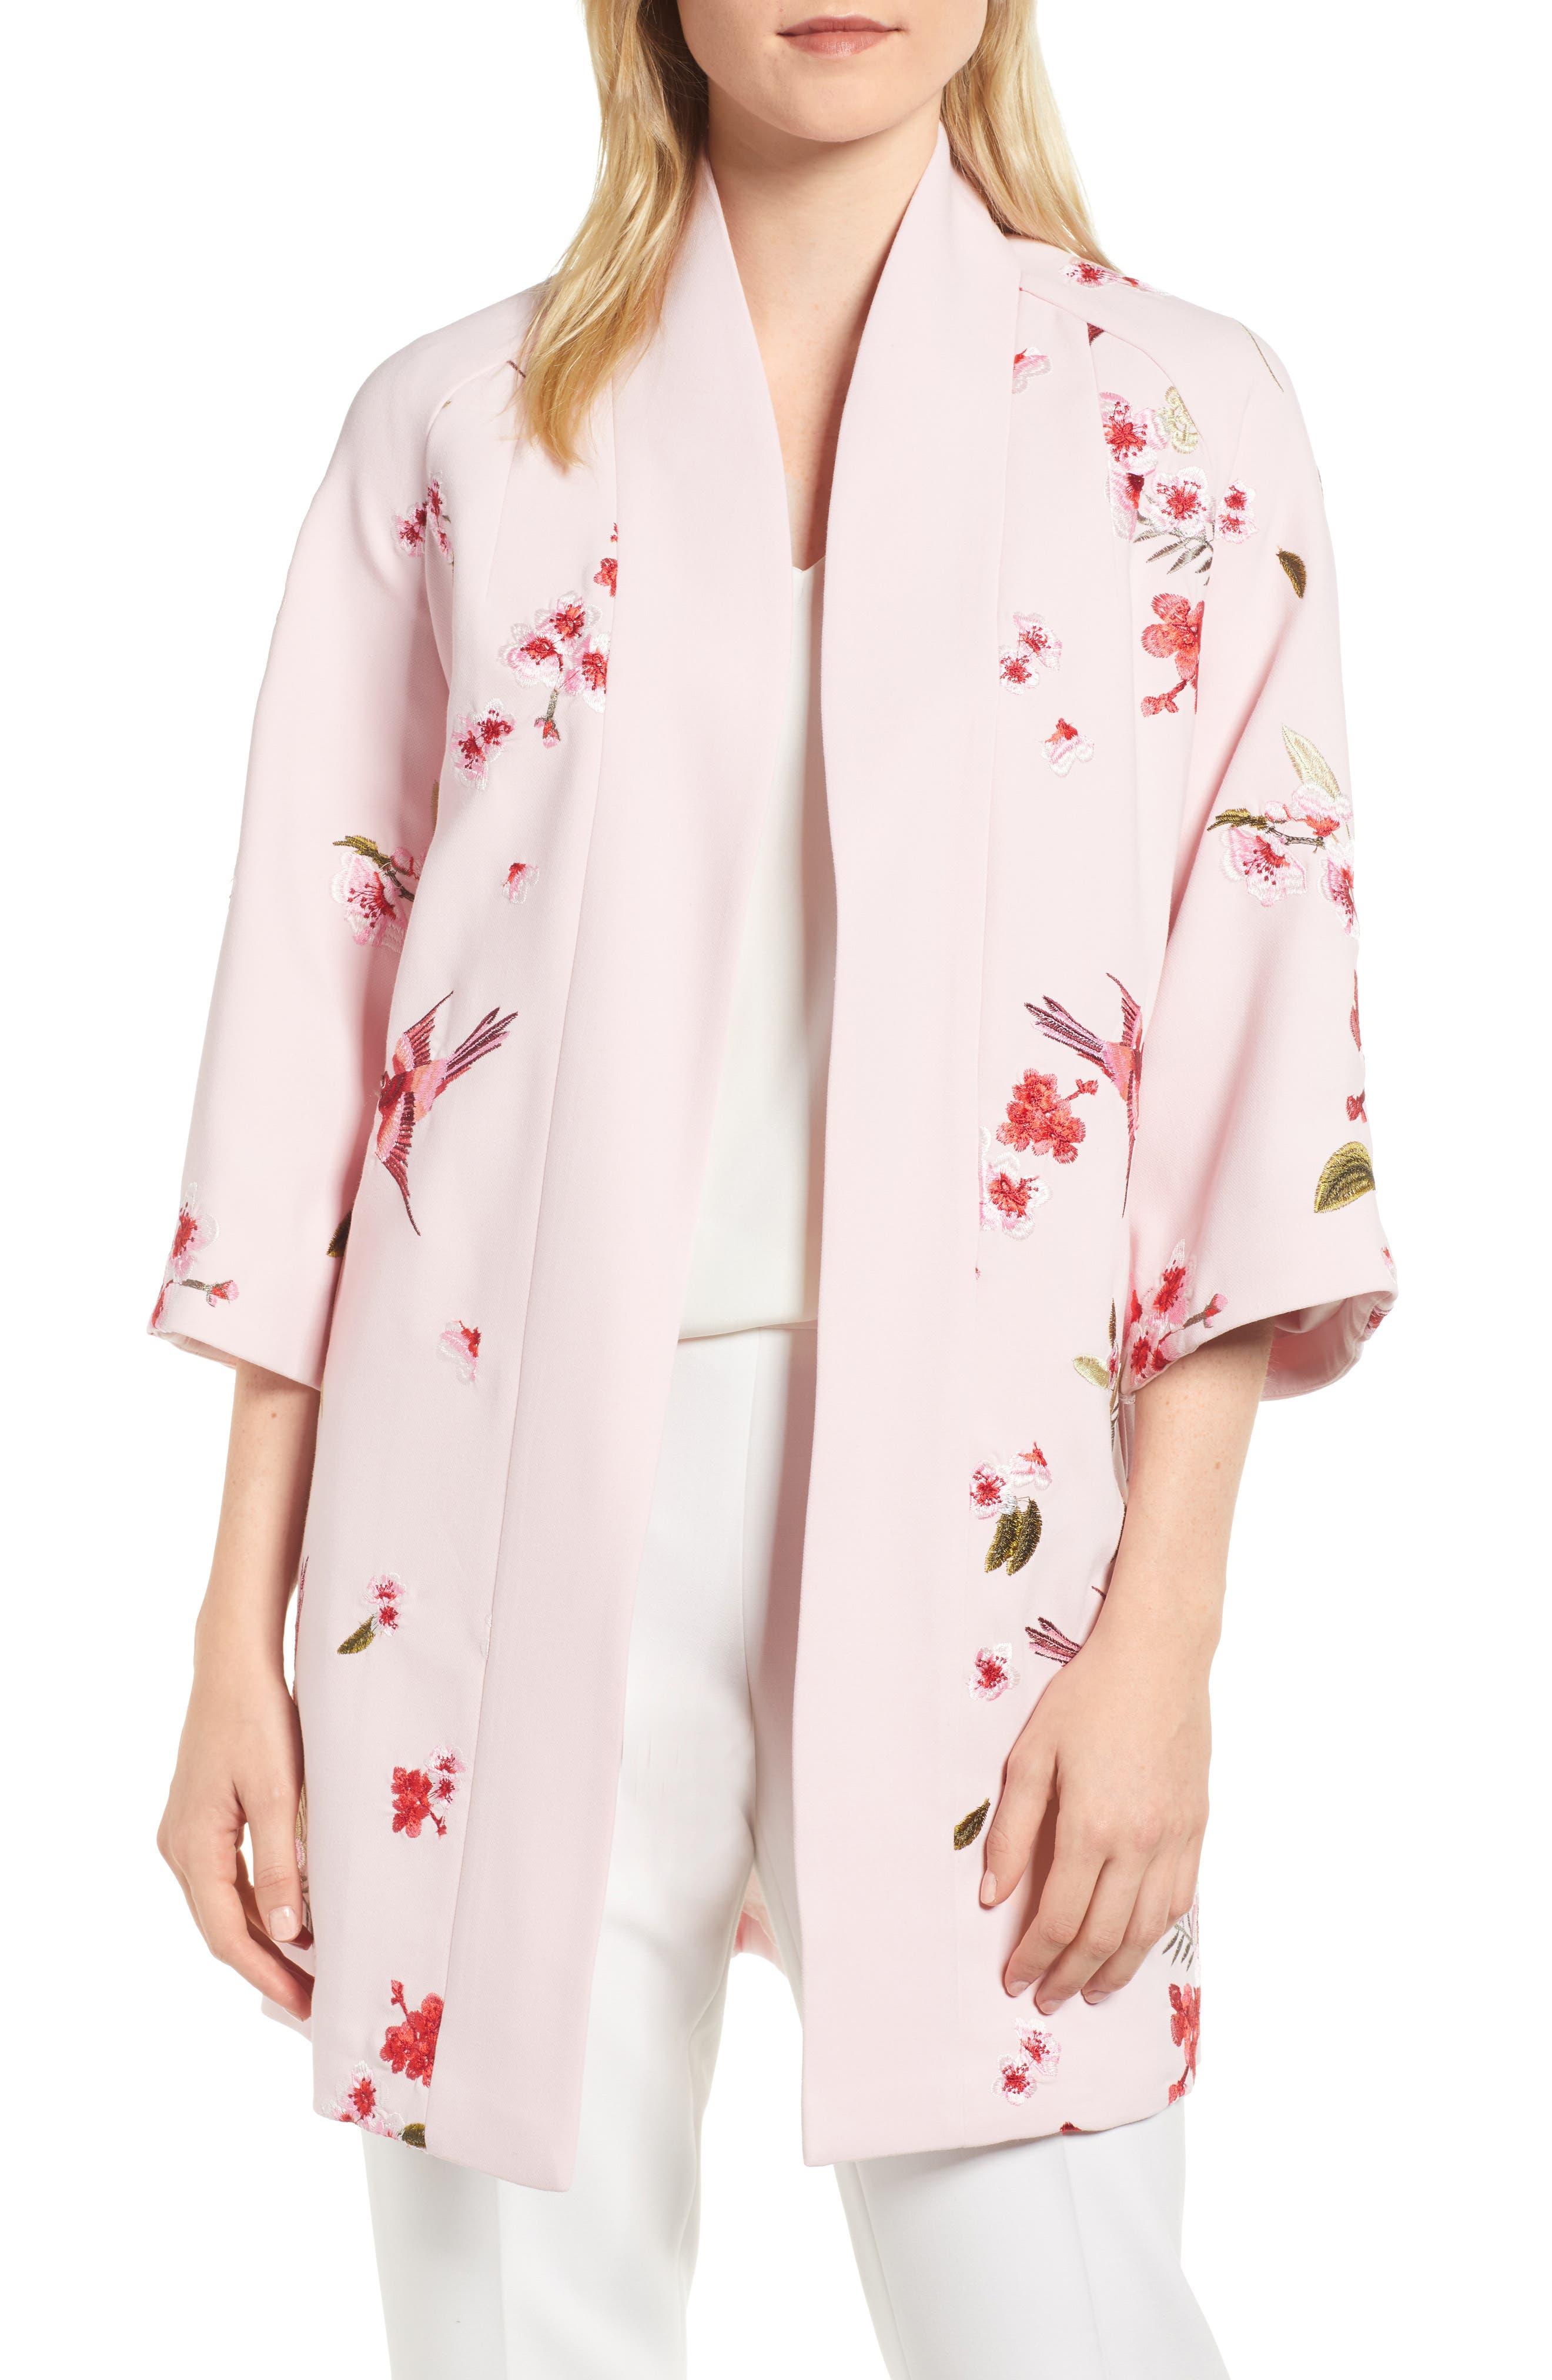 Bird & Blossom Spring Kimono,                             Main thumbnail 1, color,